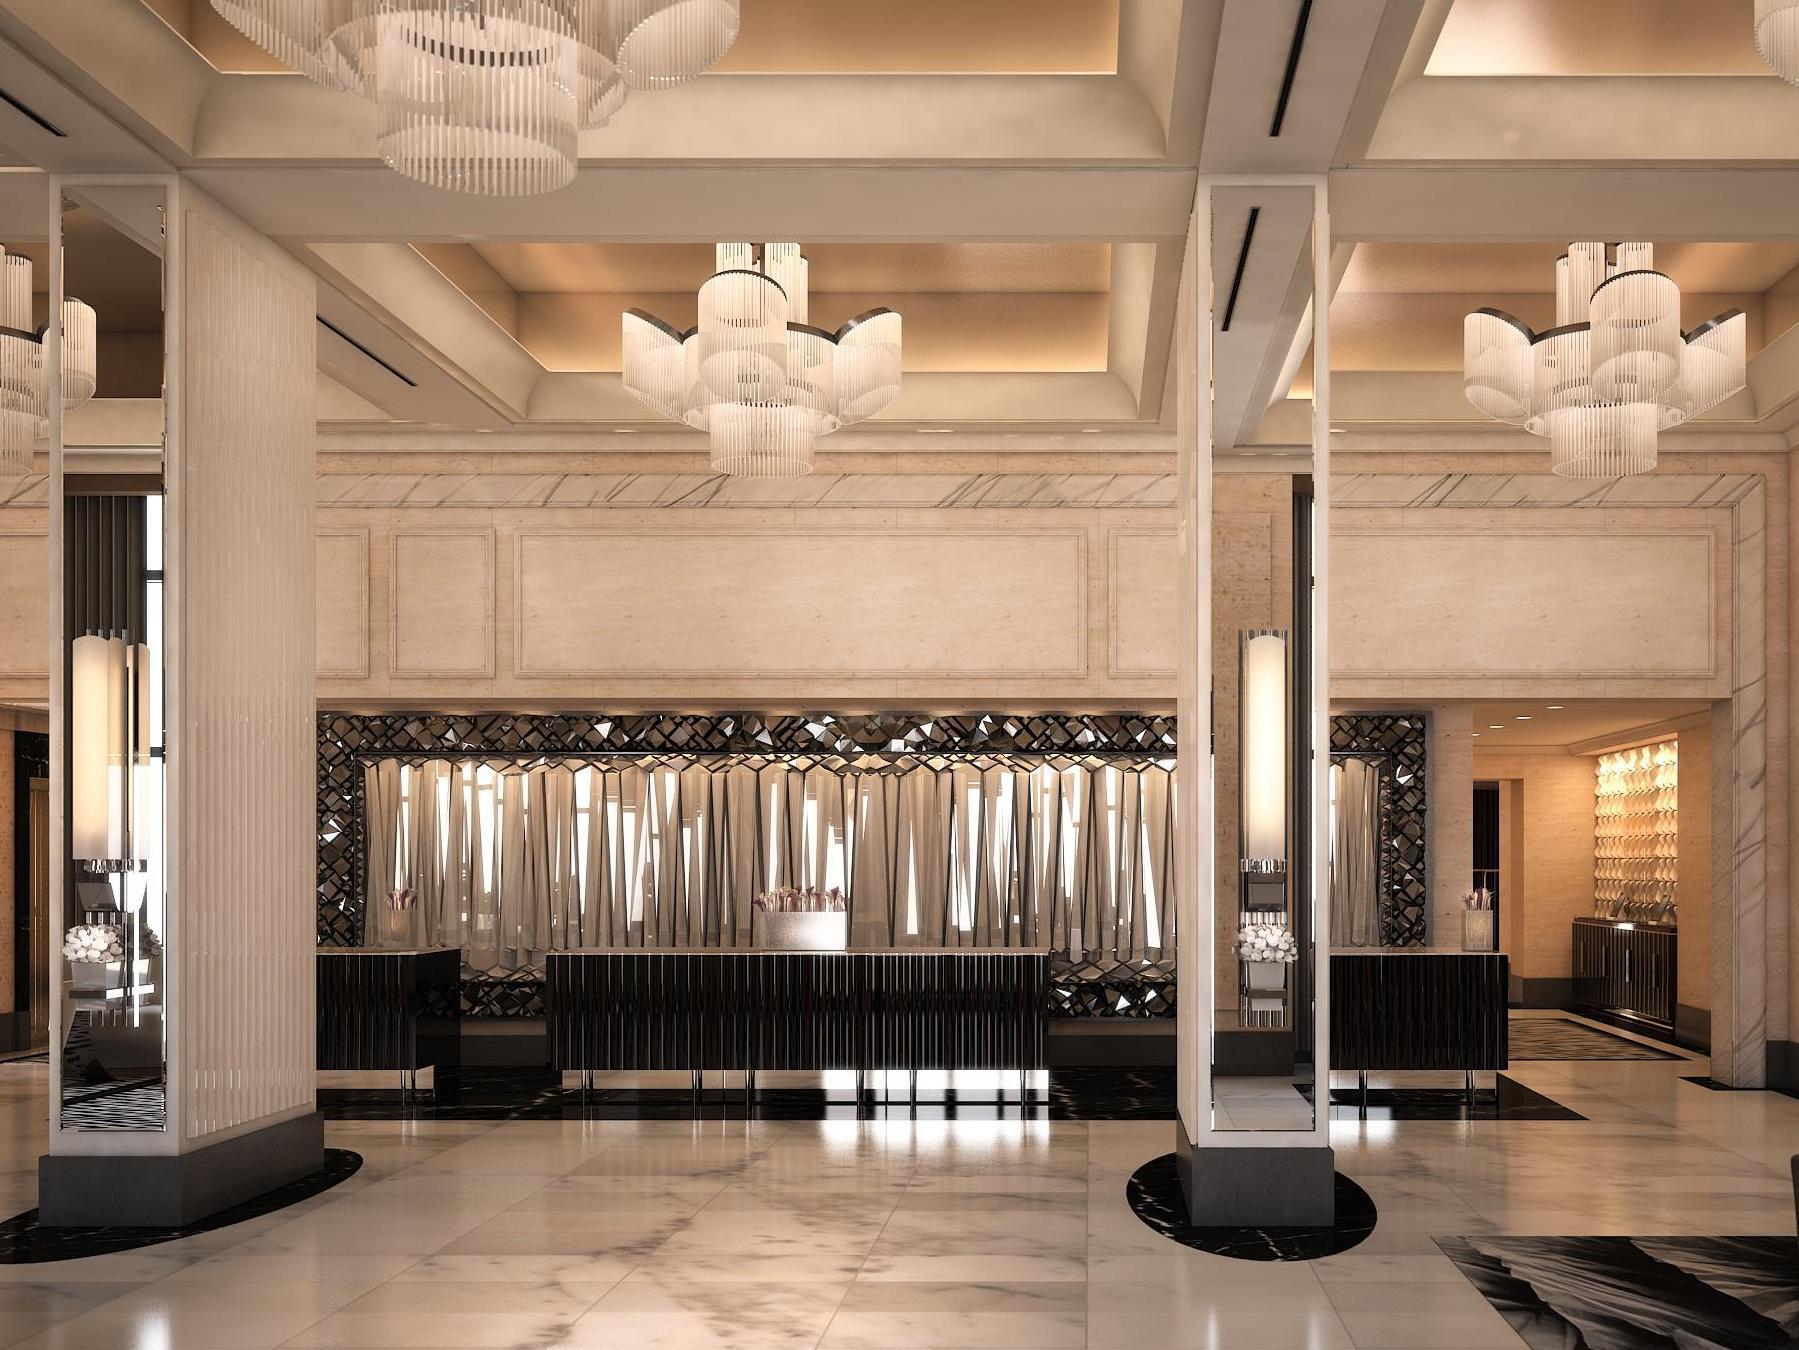 Loews Regency Hotel New York - New York